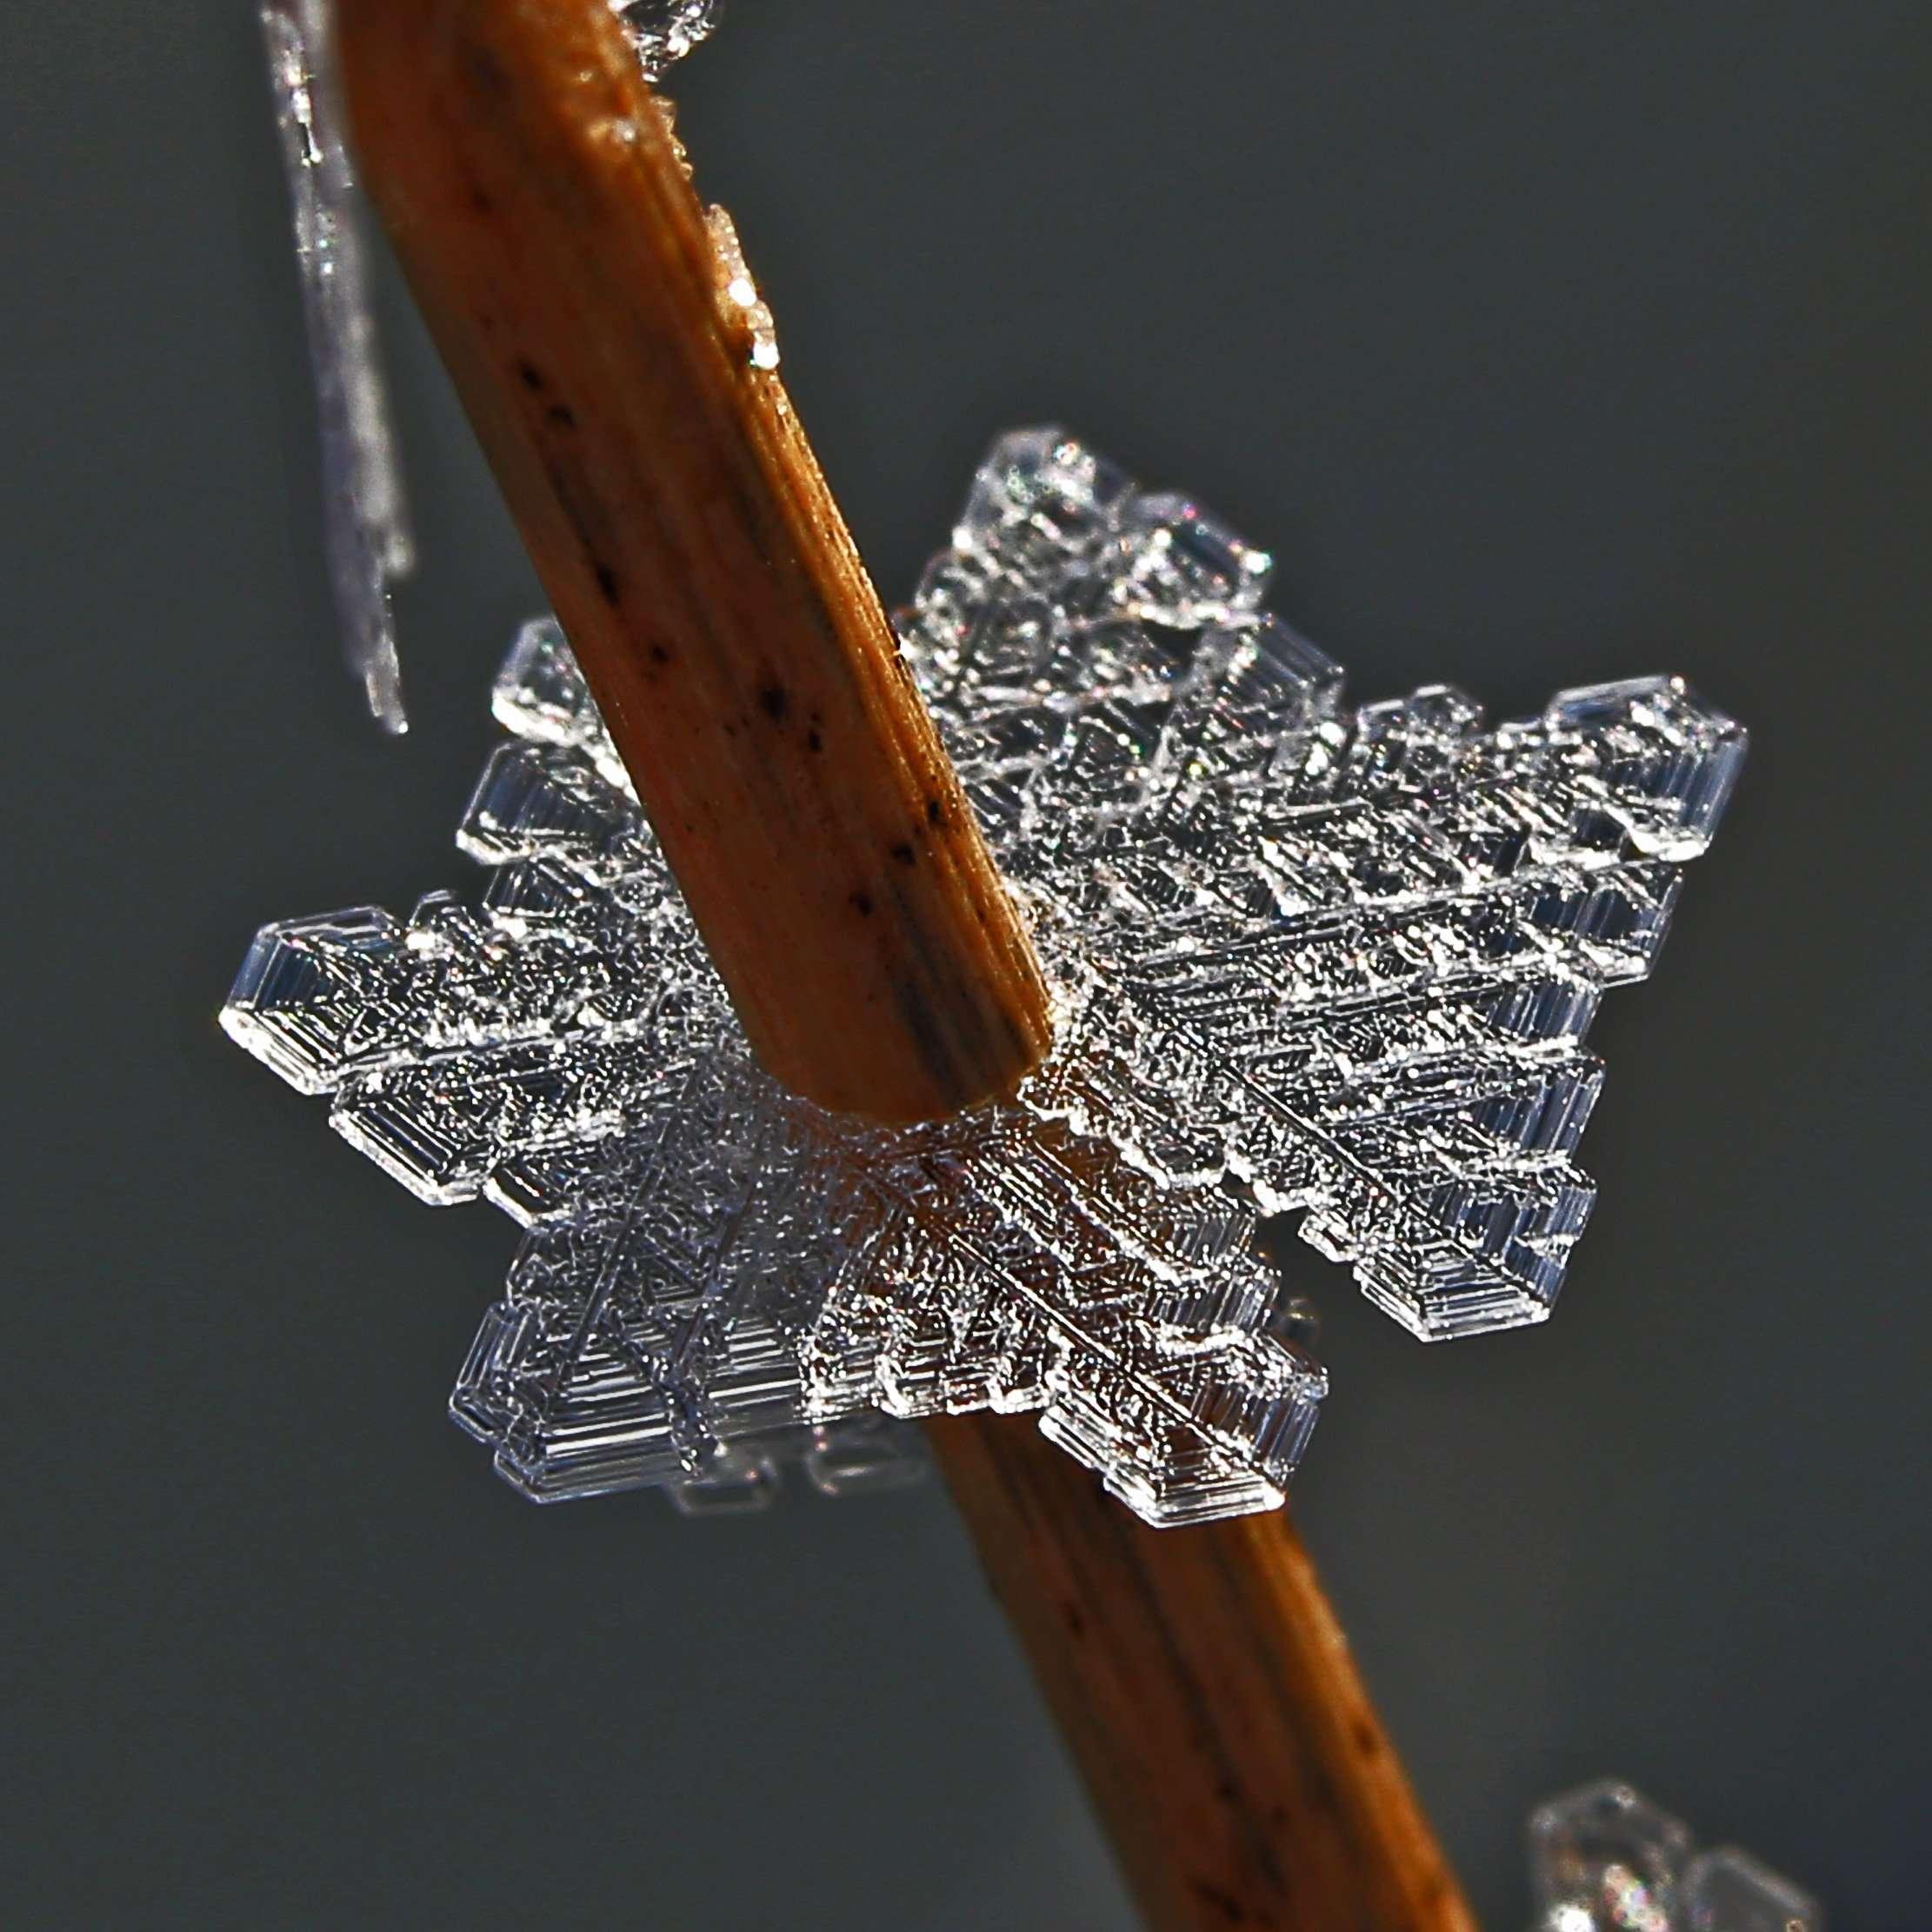 Prairie Ice Crystal on Native Grass Stem